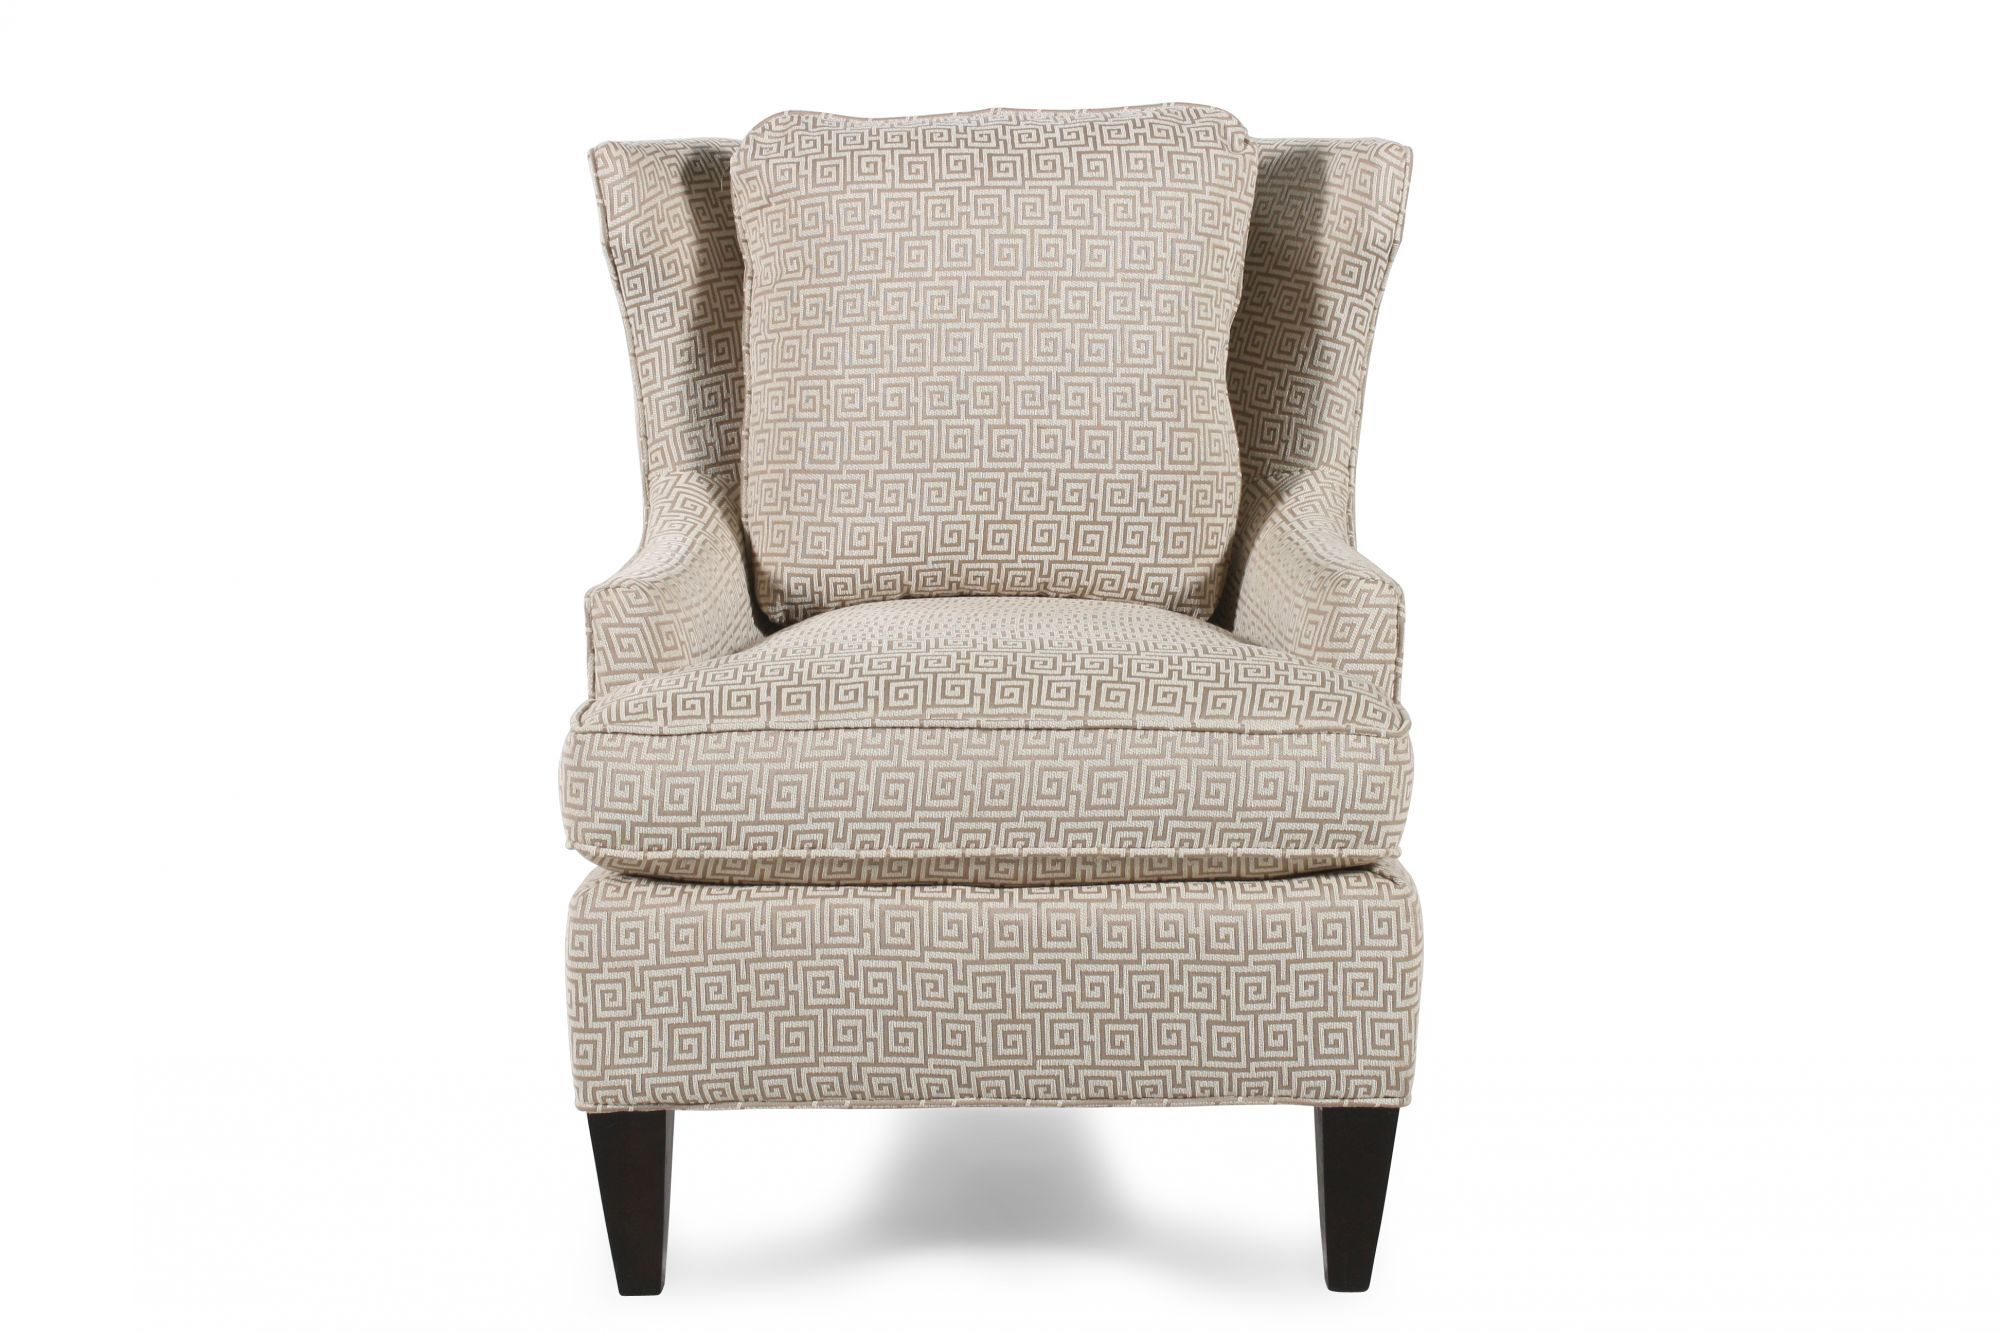 Greek Key Patterned Chair In Cream